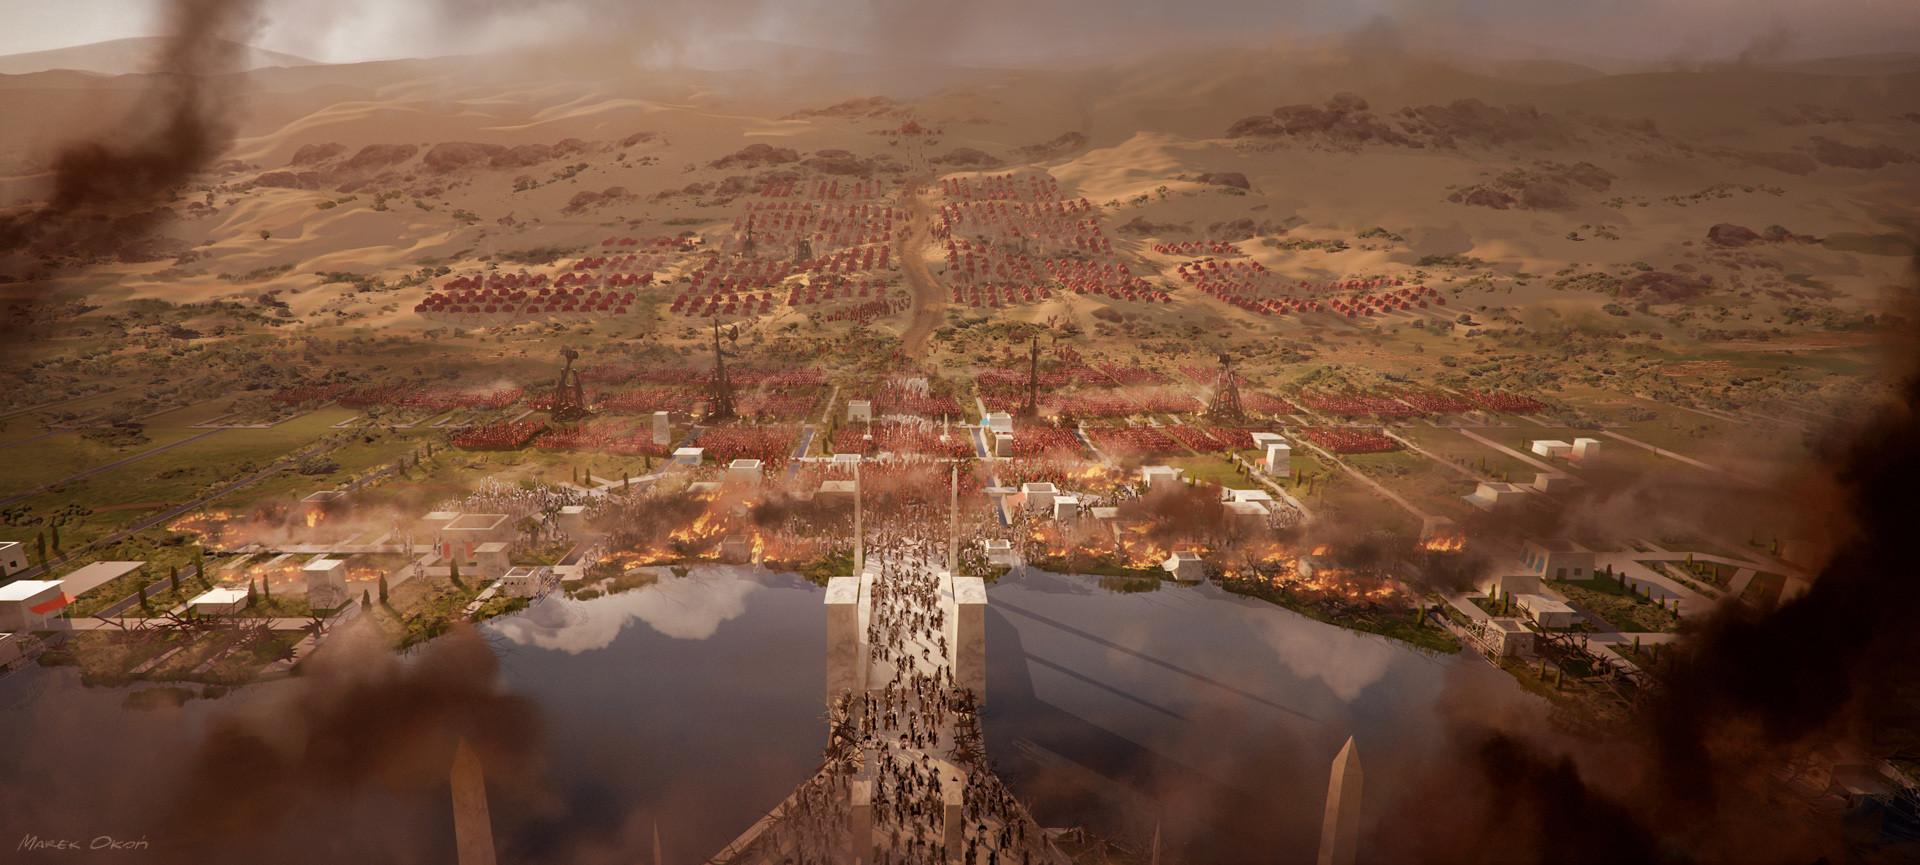 Gods of Egypt - Battlefield